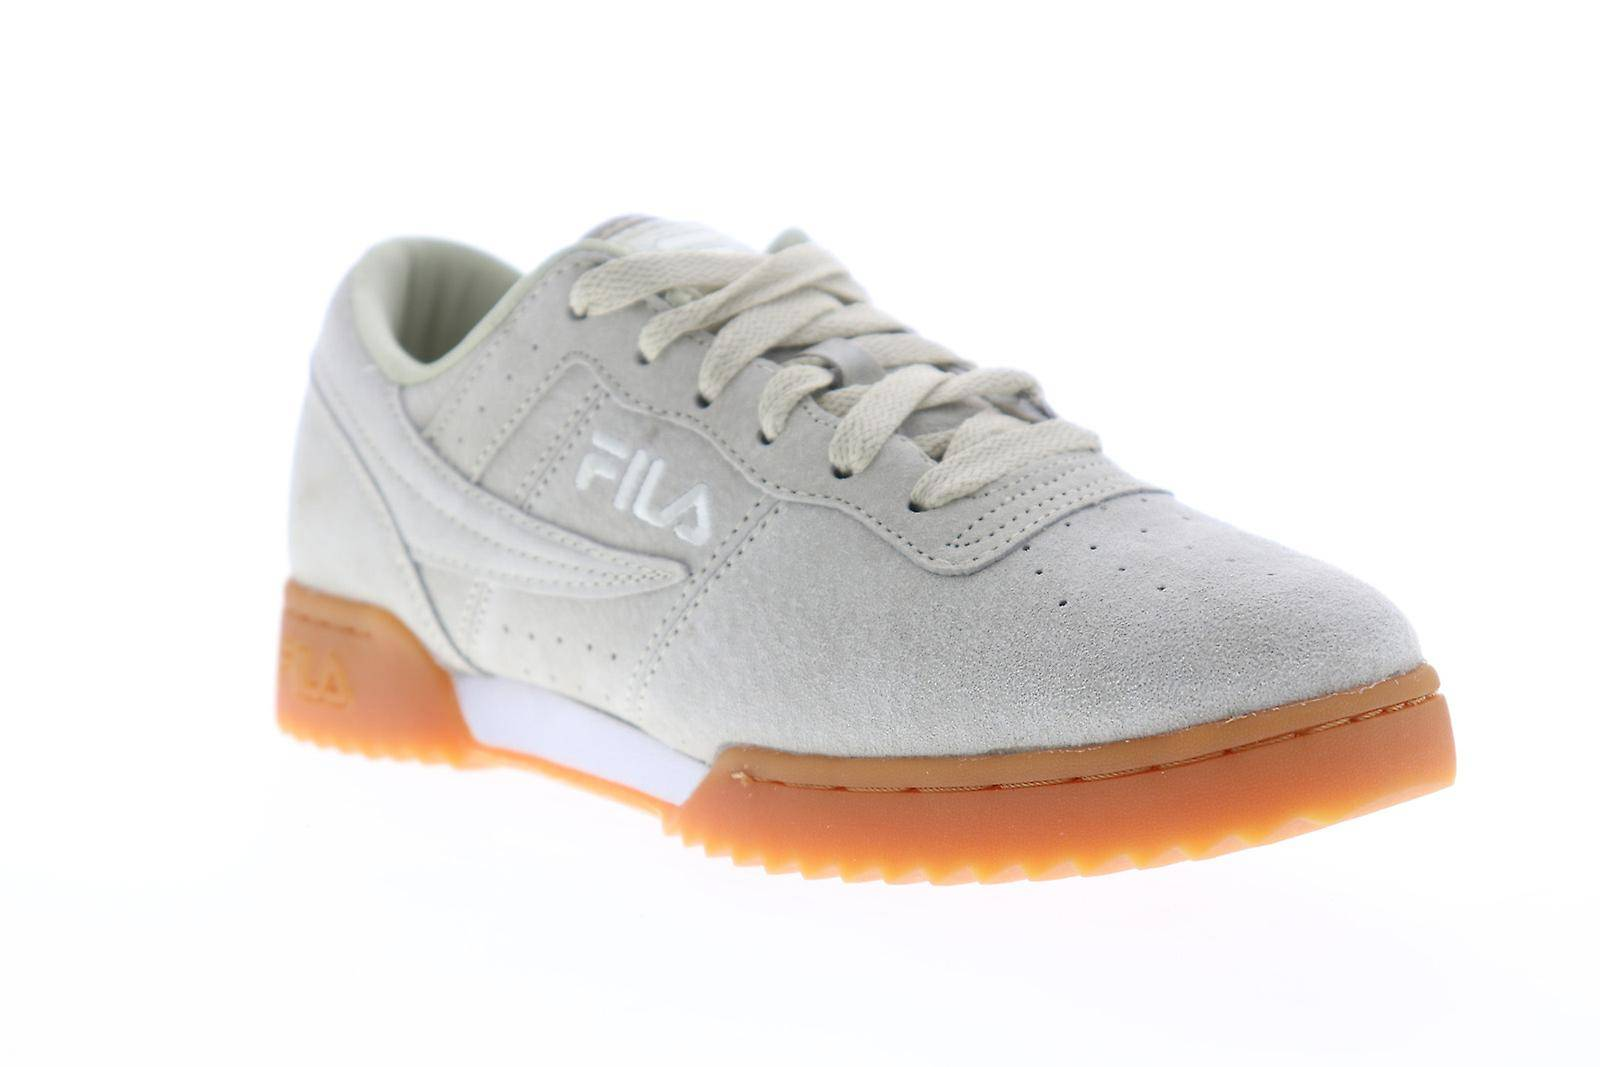 Fila Original Fitness Ripple Mens Gray Suede Casual Low Top Sneaker...